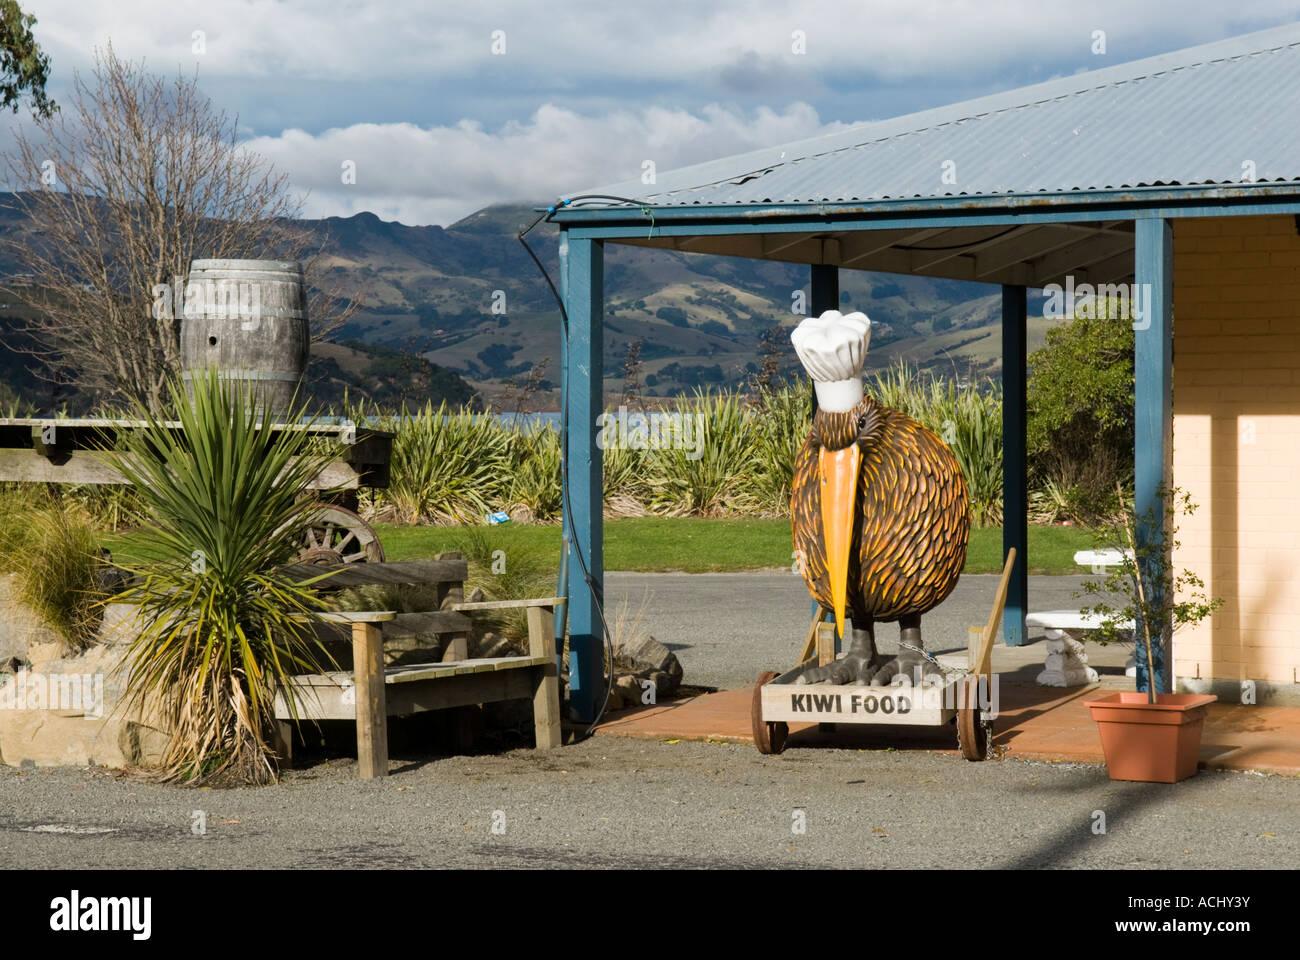 Kiwi food sign at the Duvauchelle Hotel in Duvauchelle near Akaroa New Zealand - Stock Image